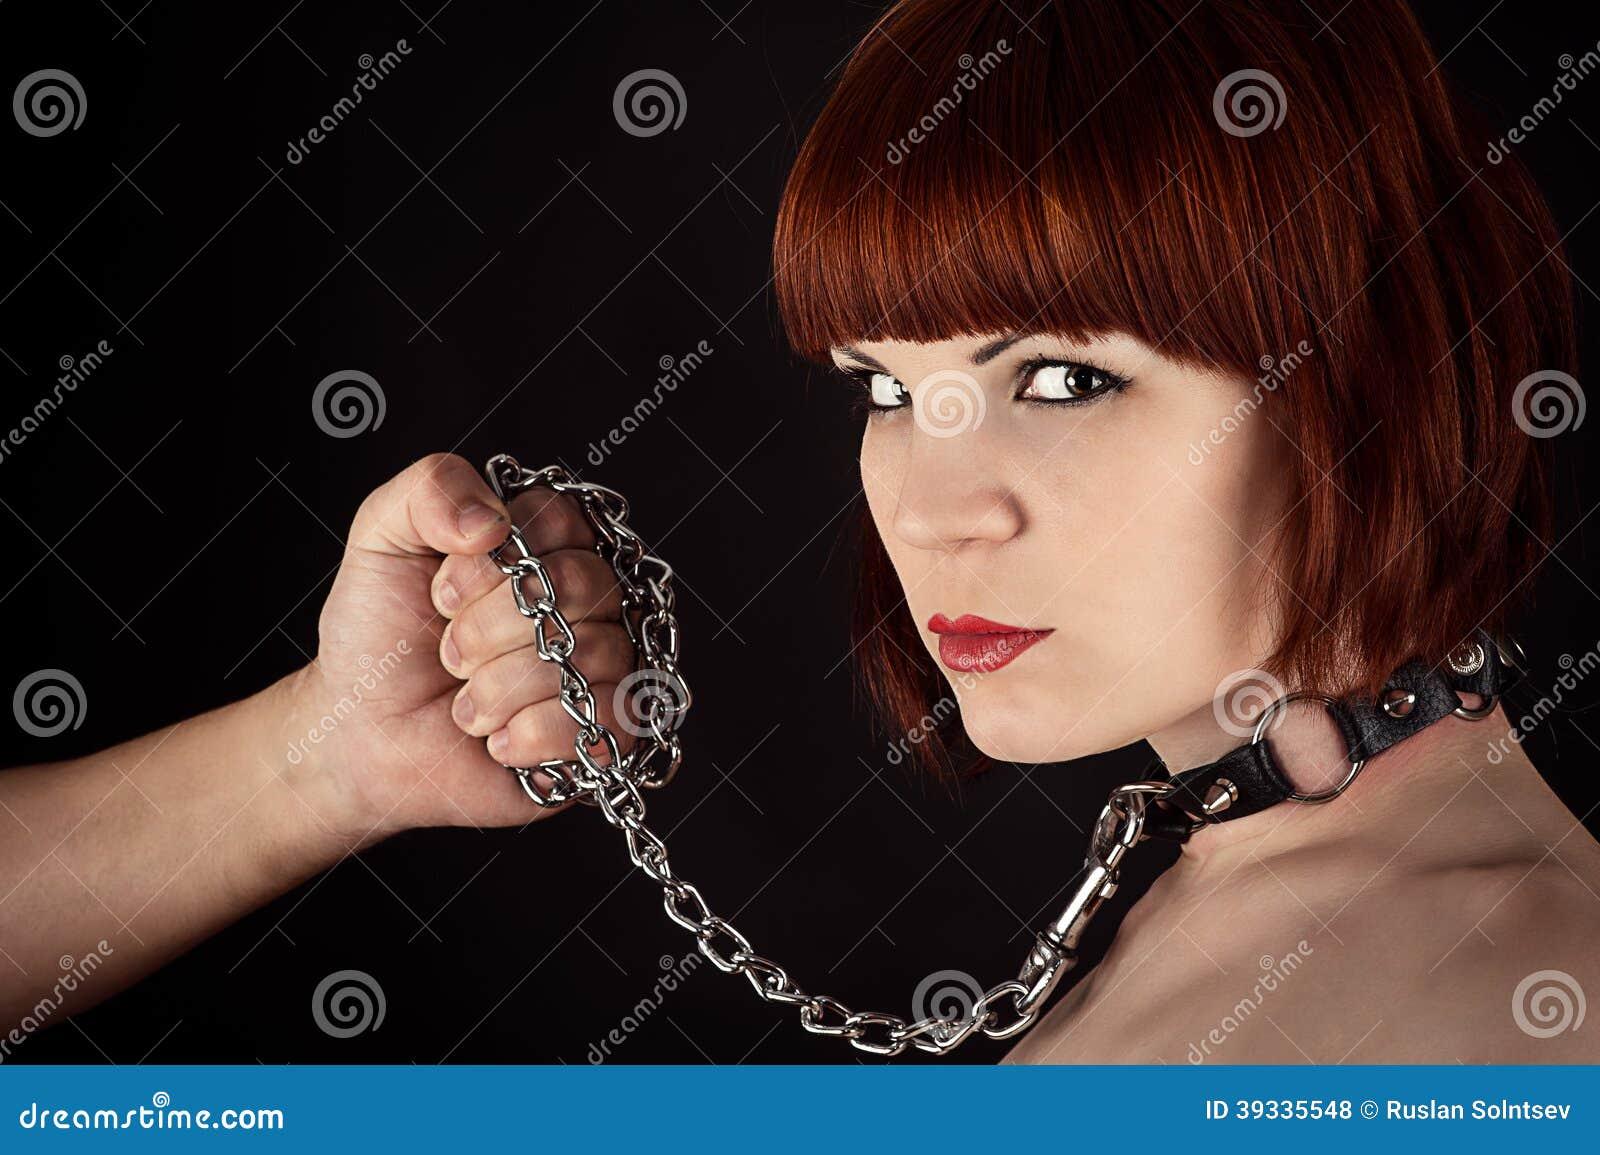 bondage discipline woman